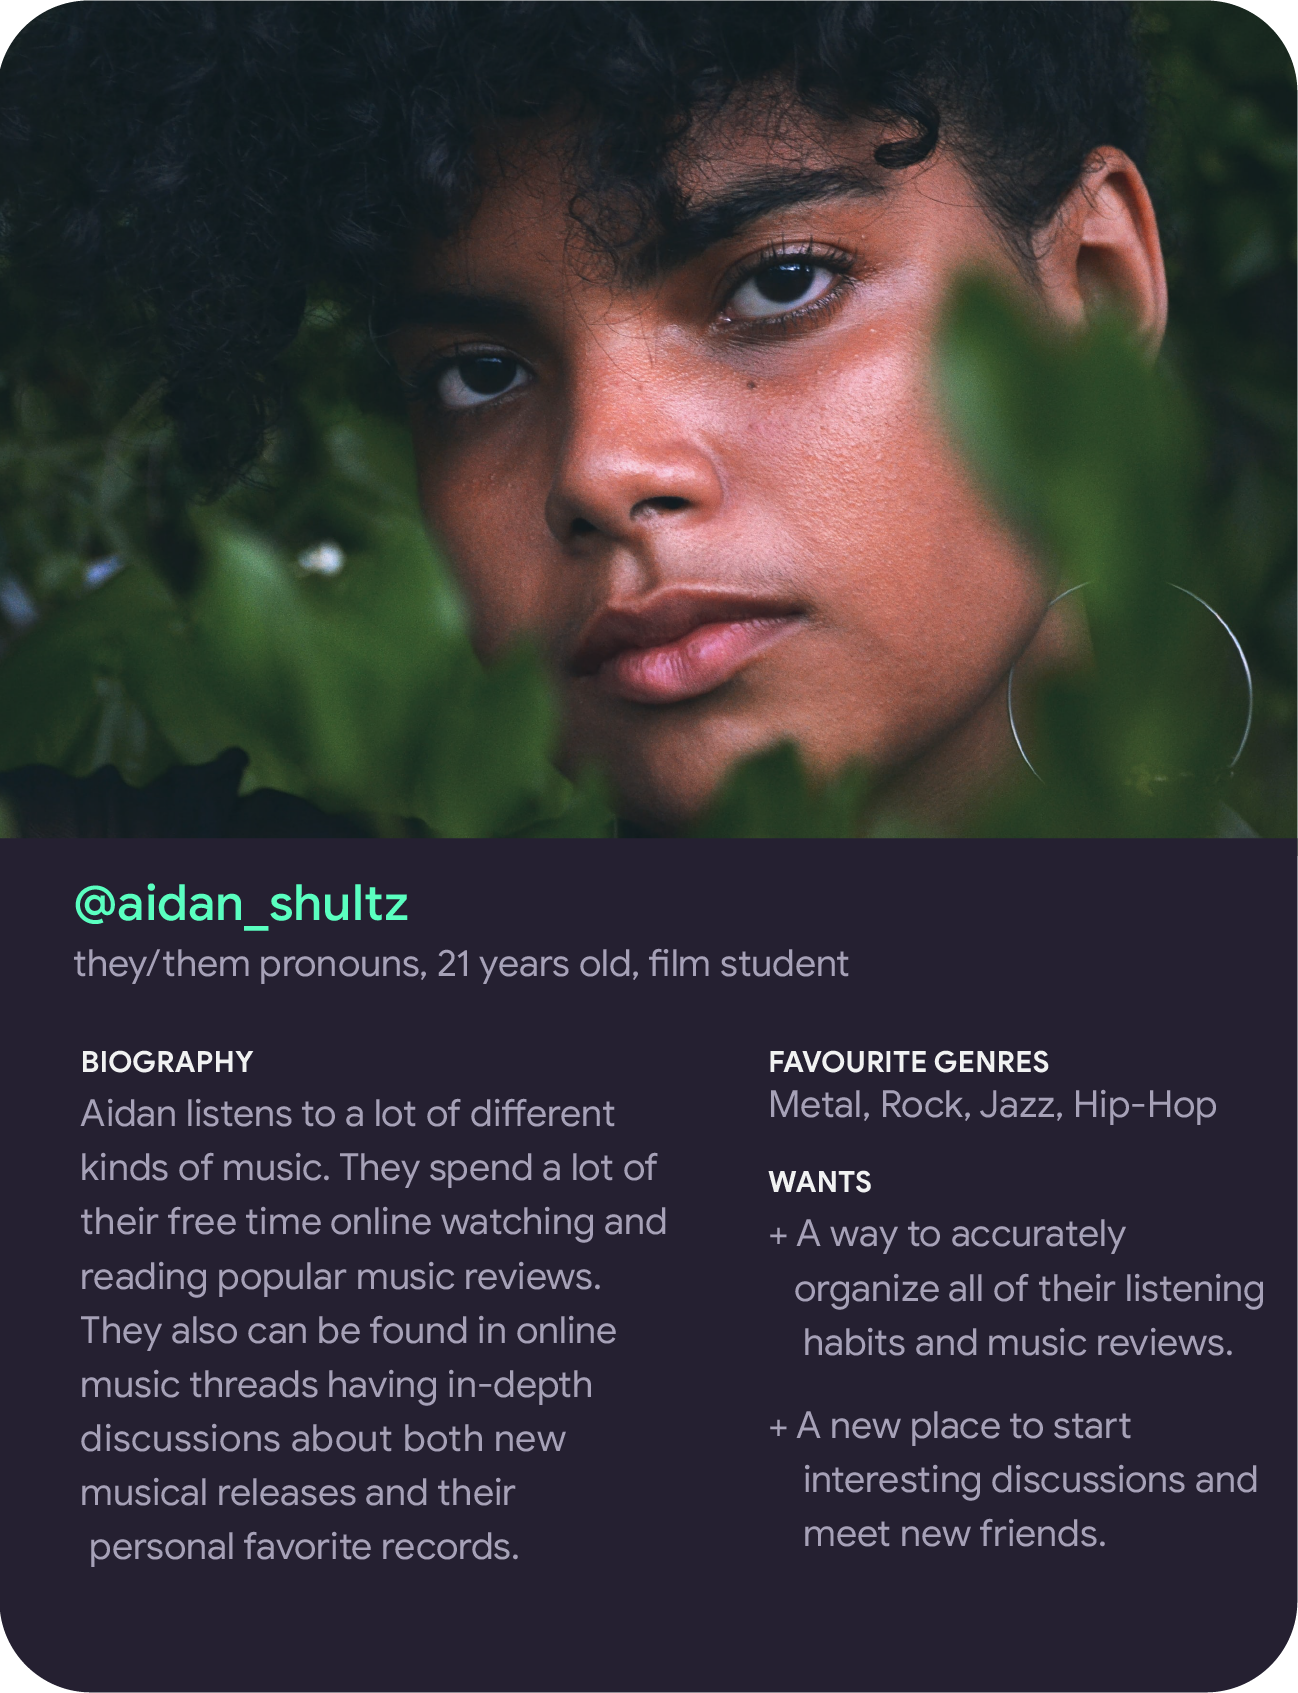 Persona of Aidan Shultz